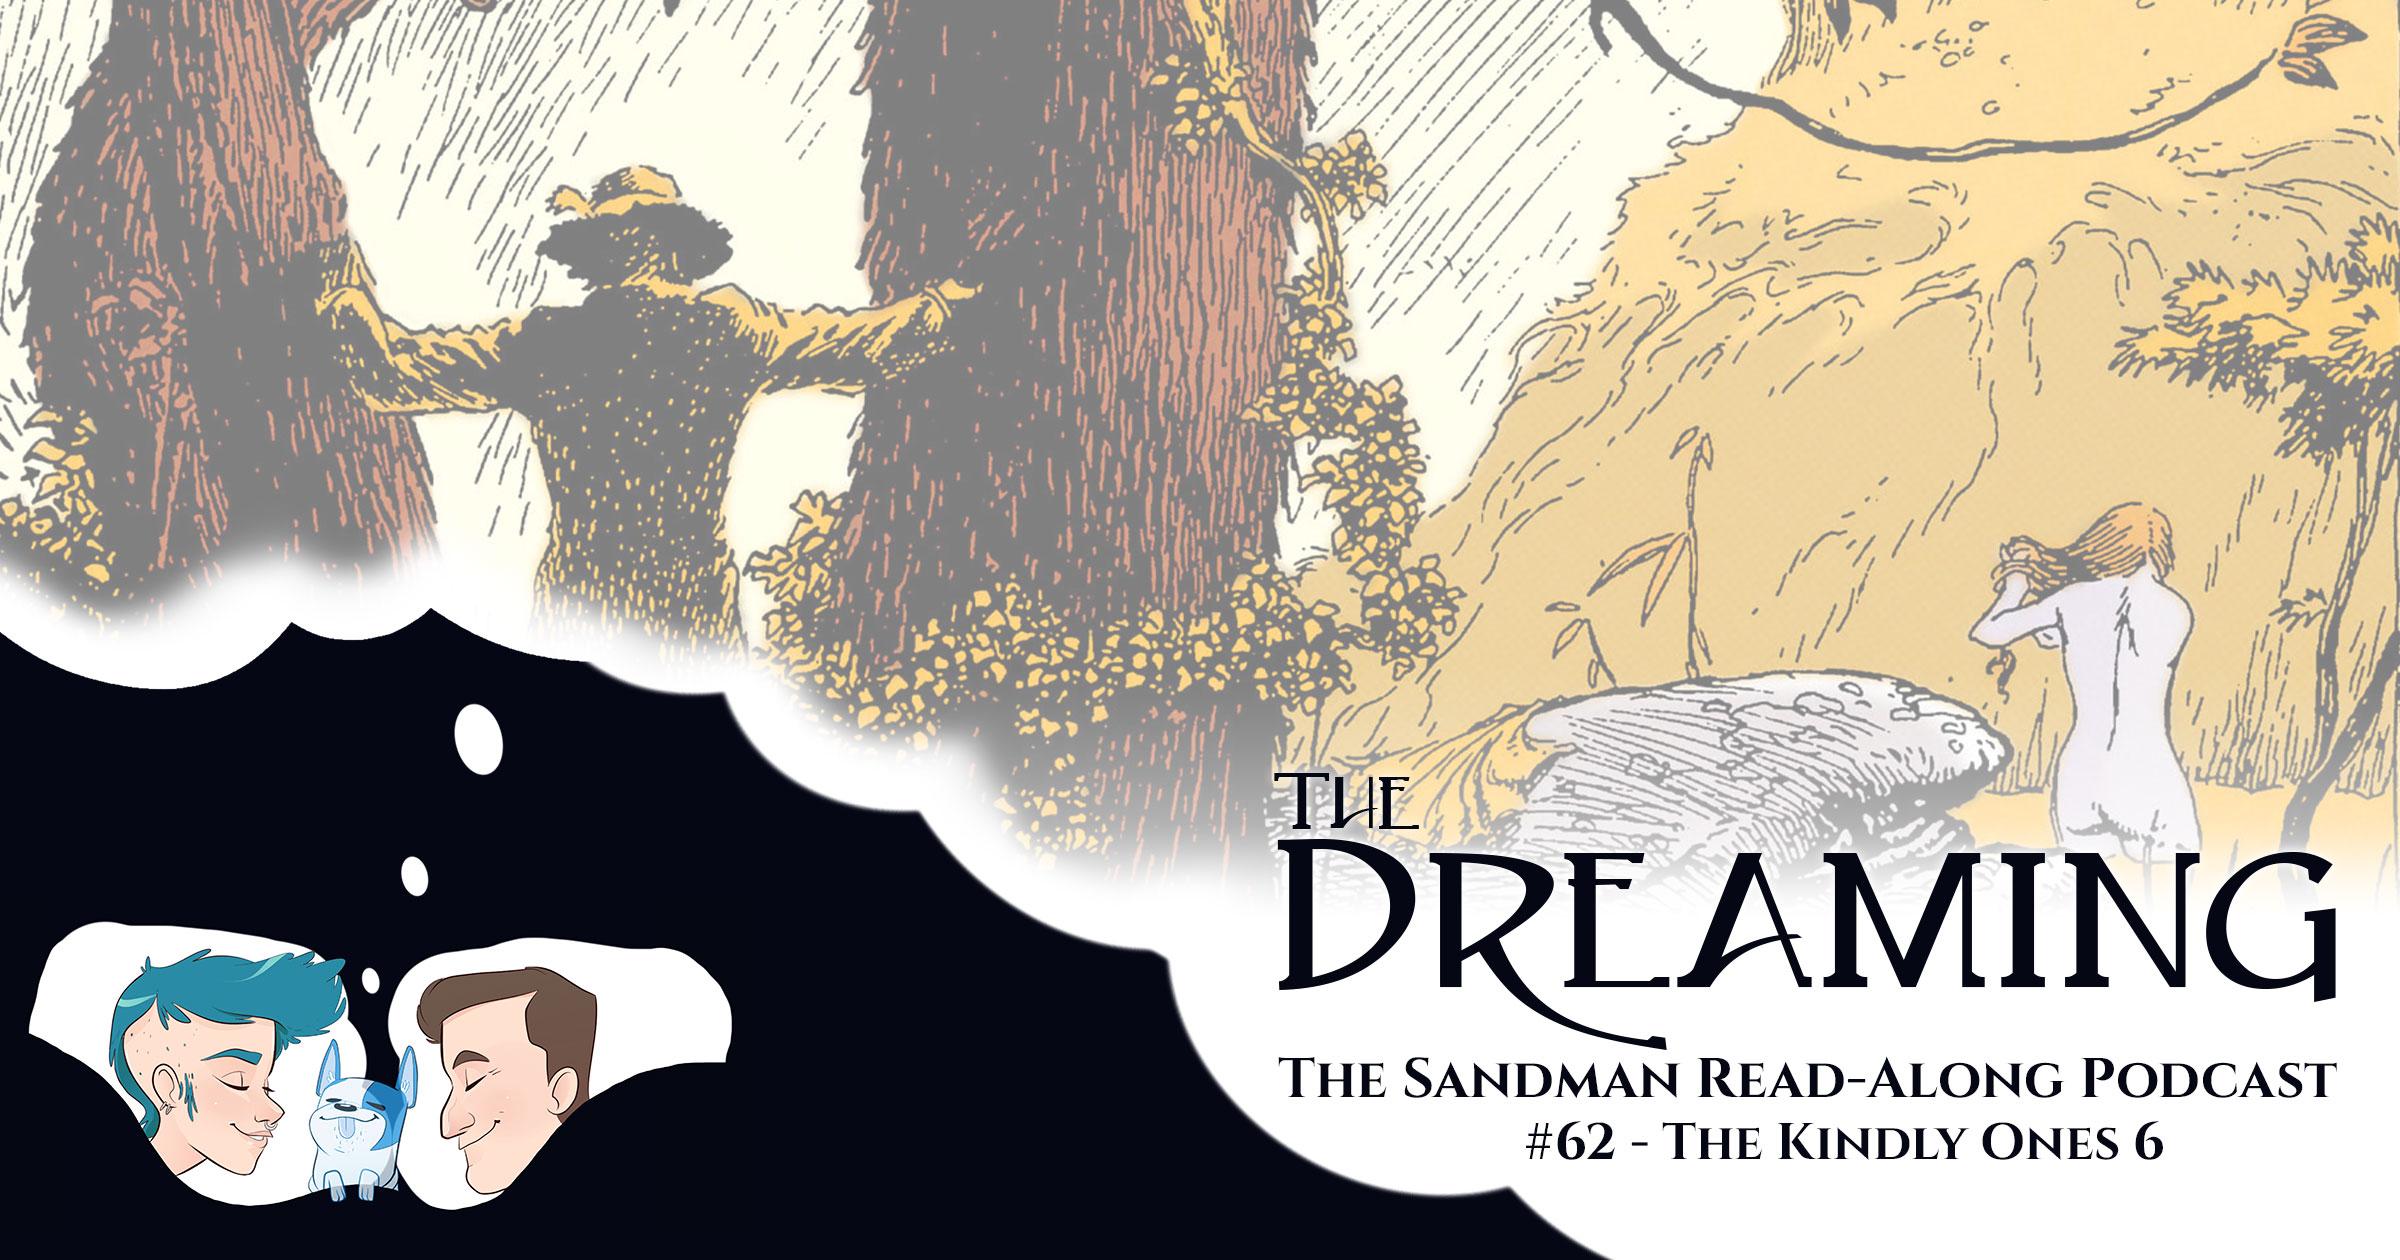 thedreaming-62-sandman62-titlecard